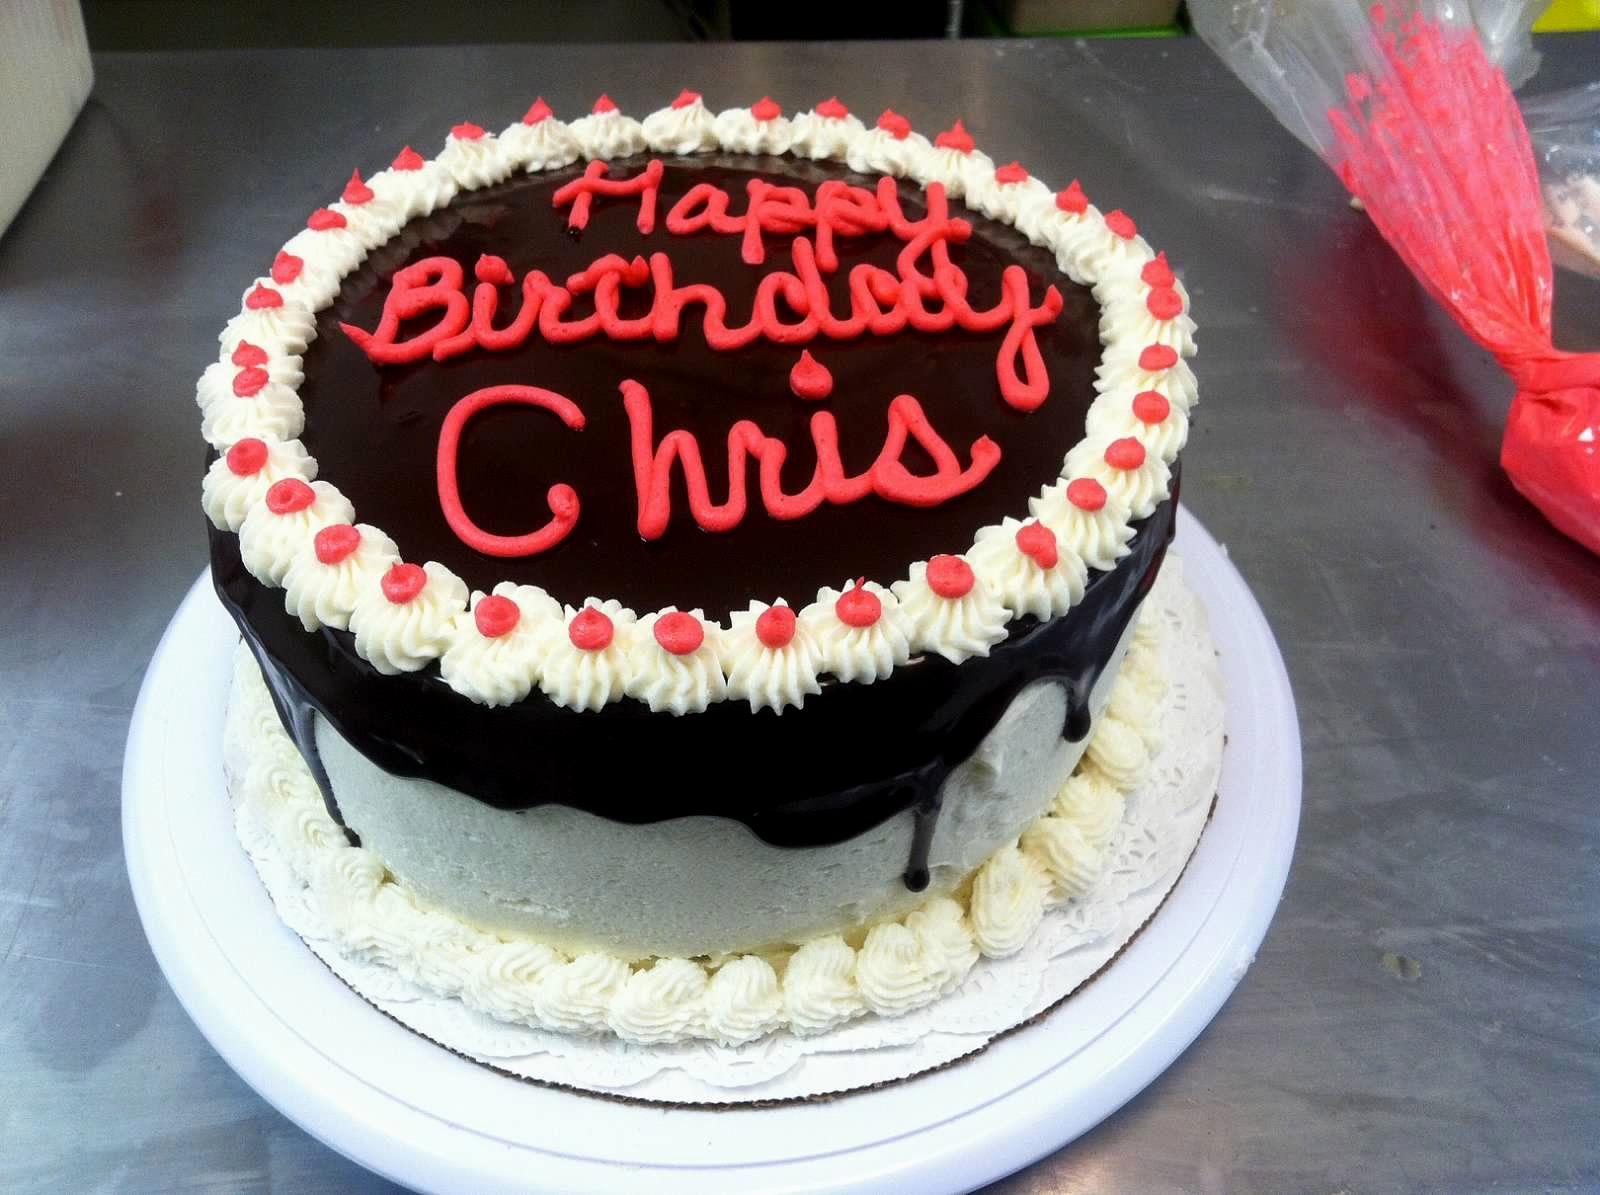 Cake Happy Birthday Chris Cake Images